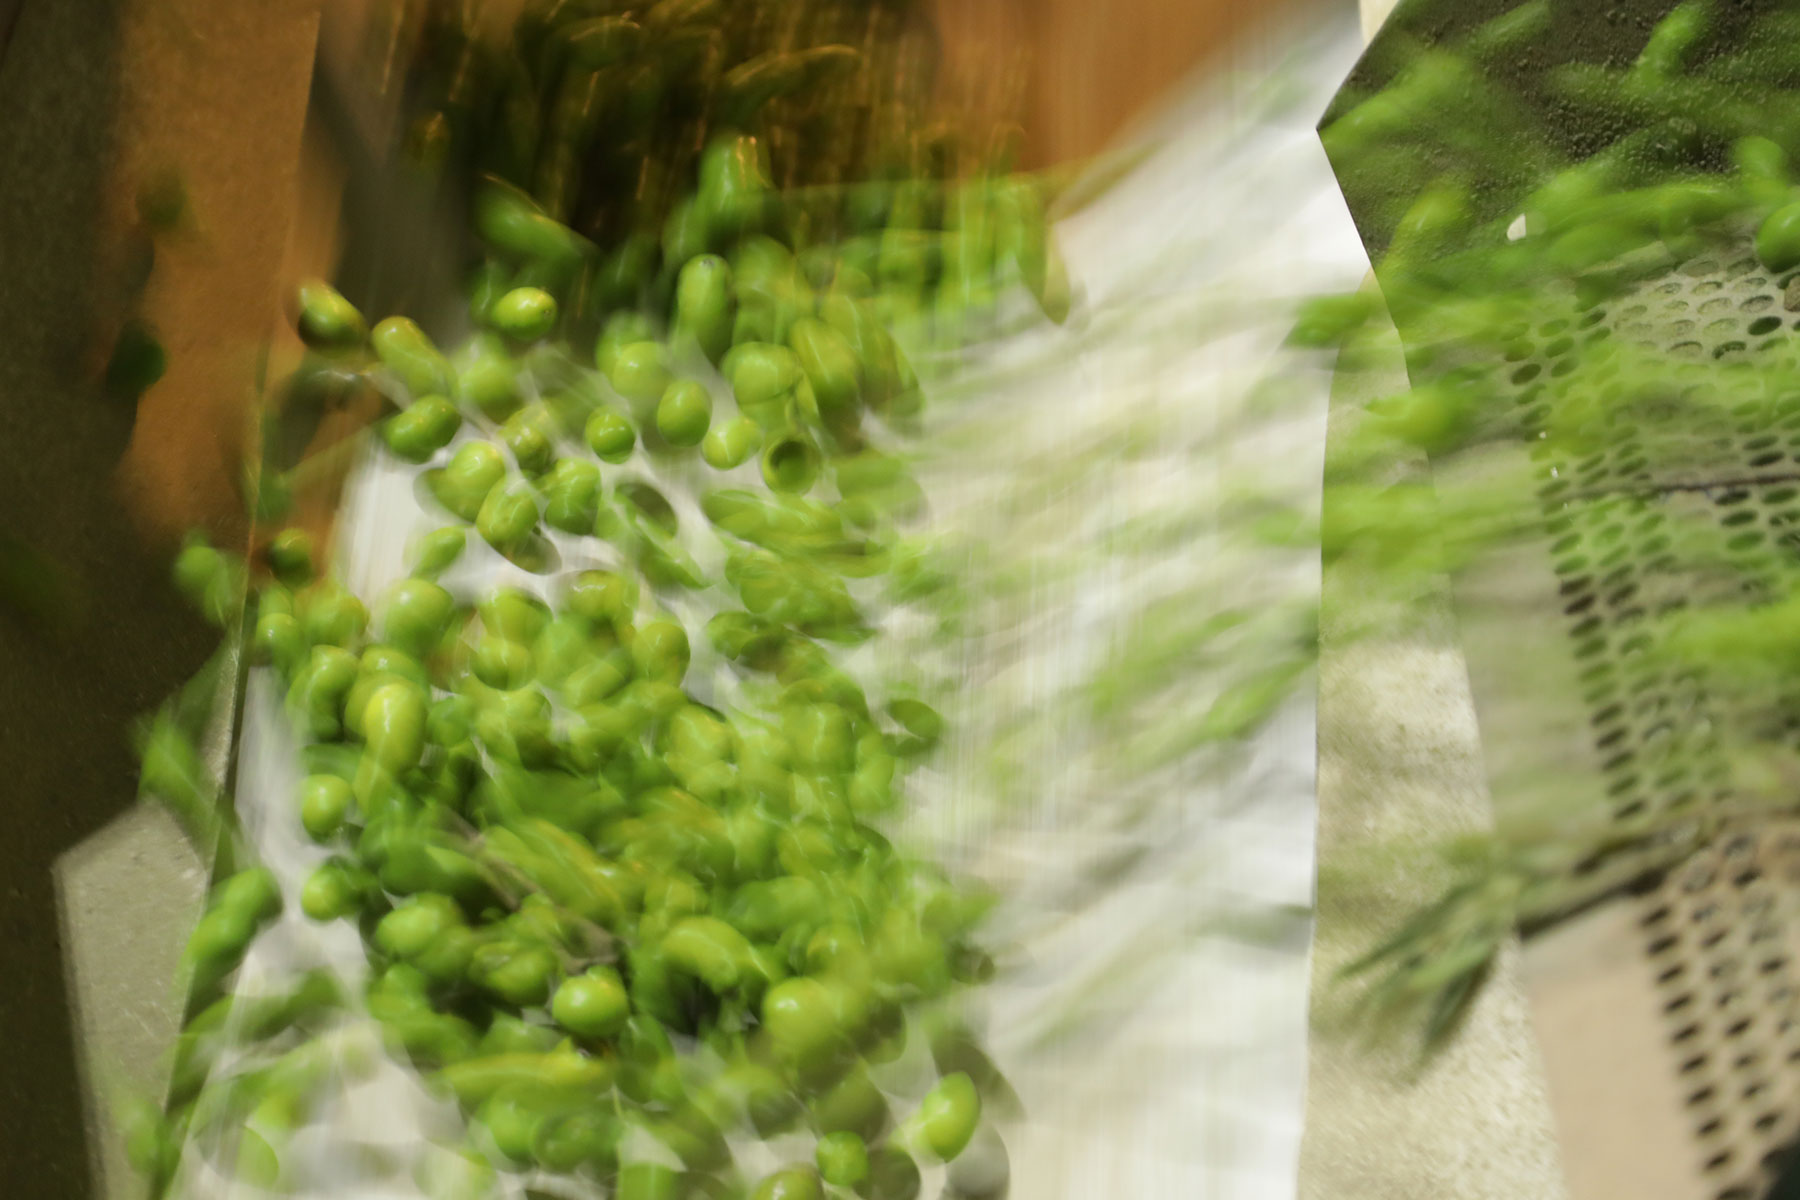 Aceitex---Aceite-de-oliva-virgen-extra--Transporte